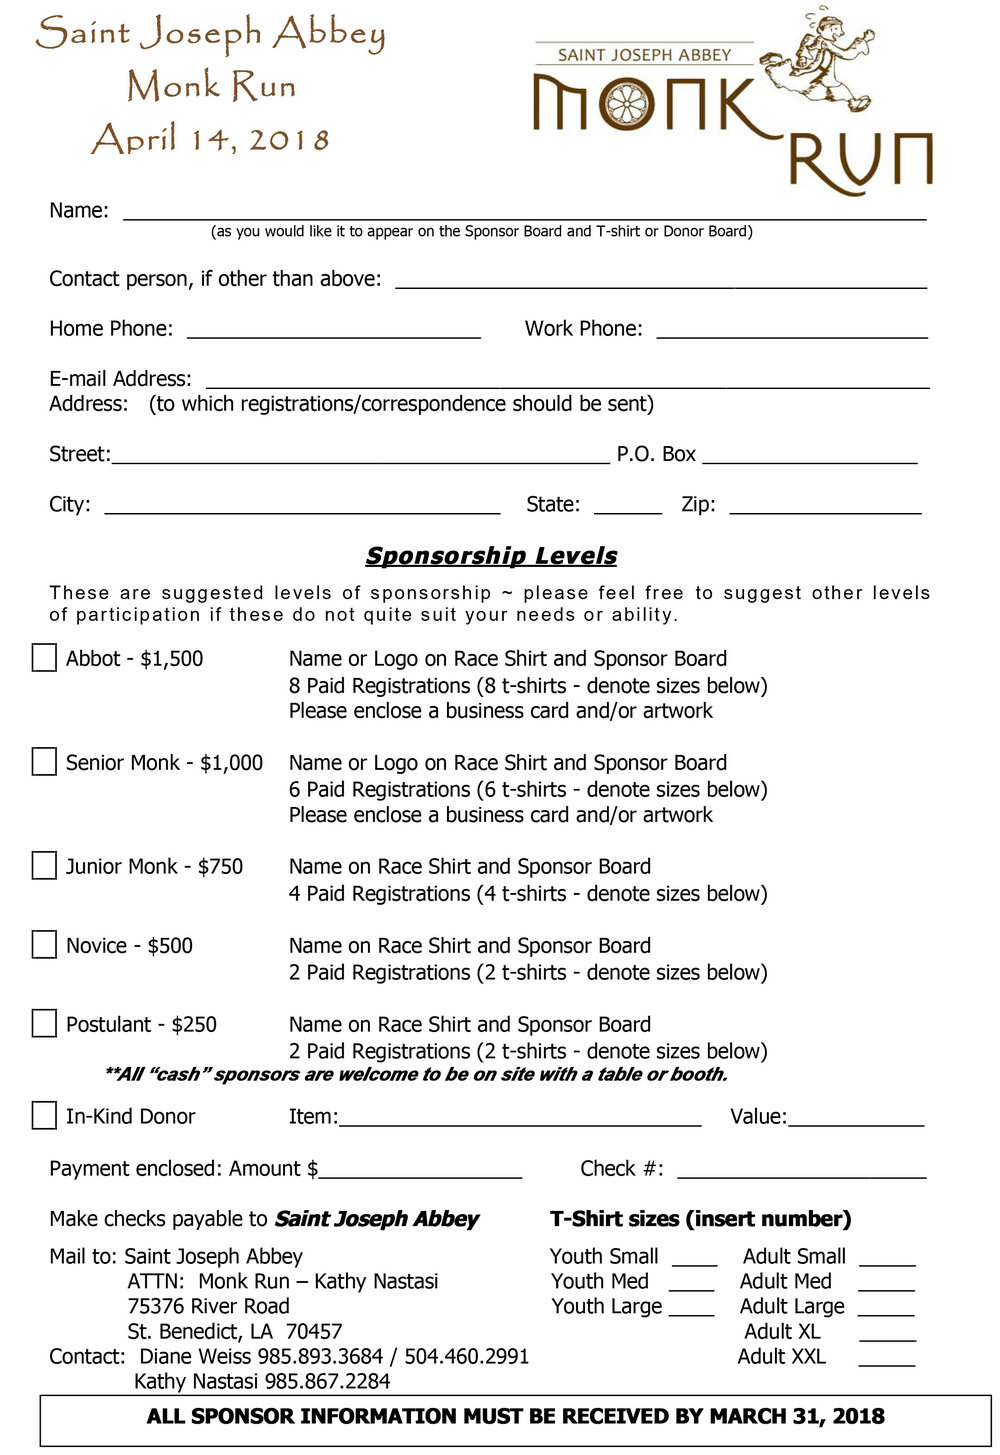 Monk Run Sponsor Form 04-14-18.jpg